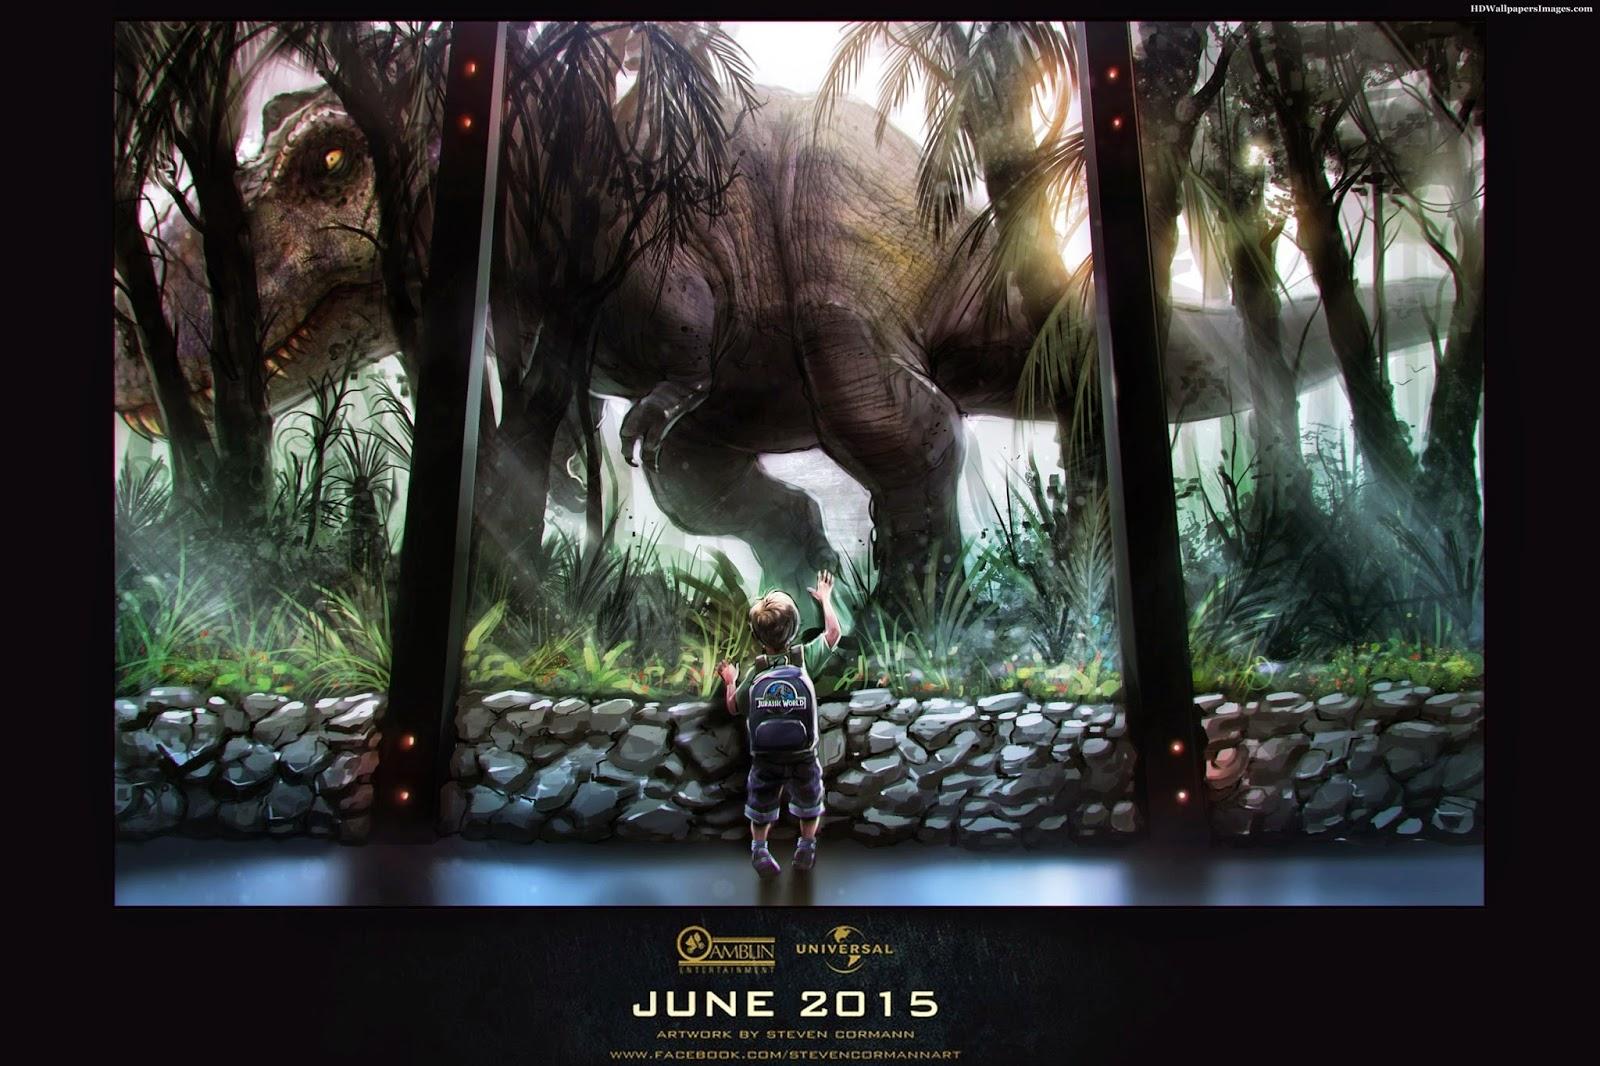 world 2015 movie poster - photo #41